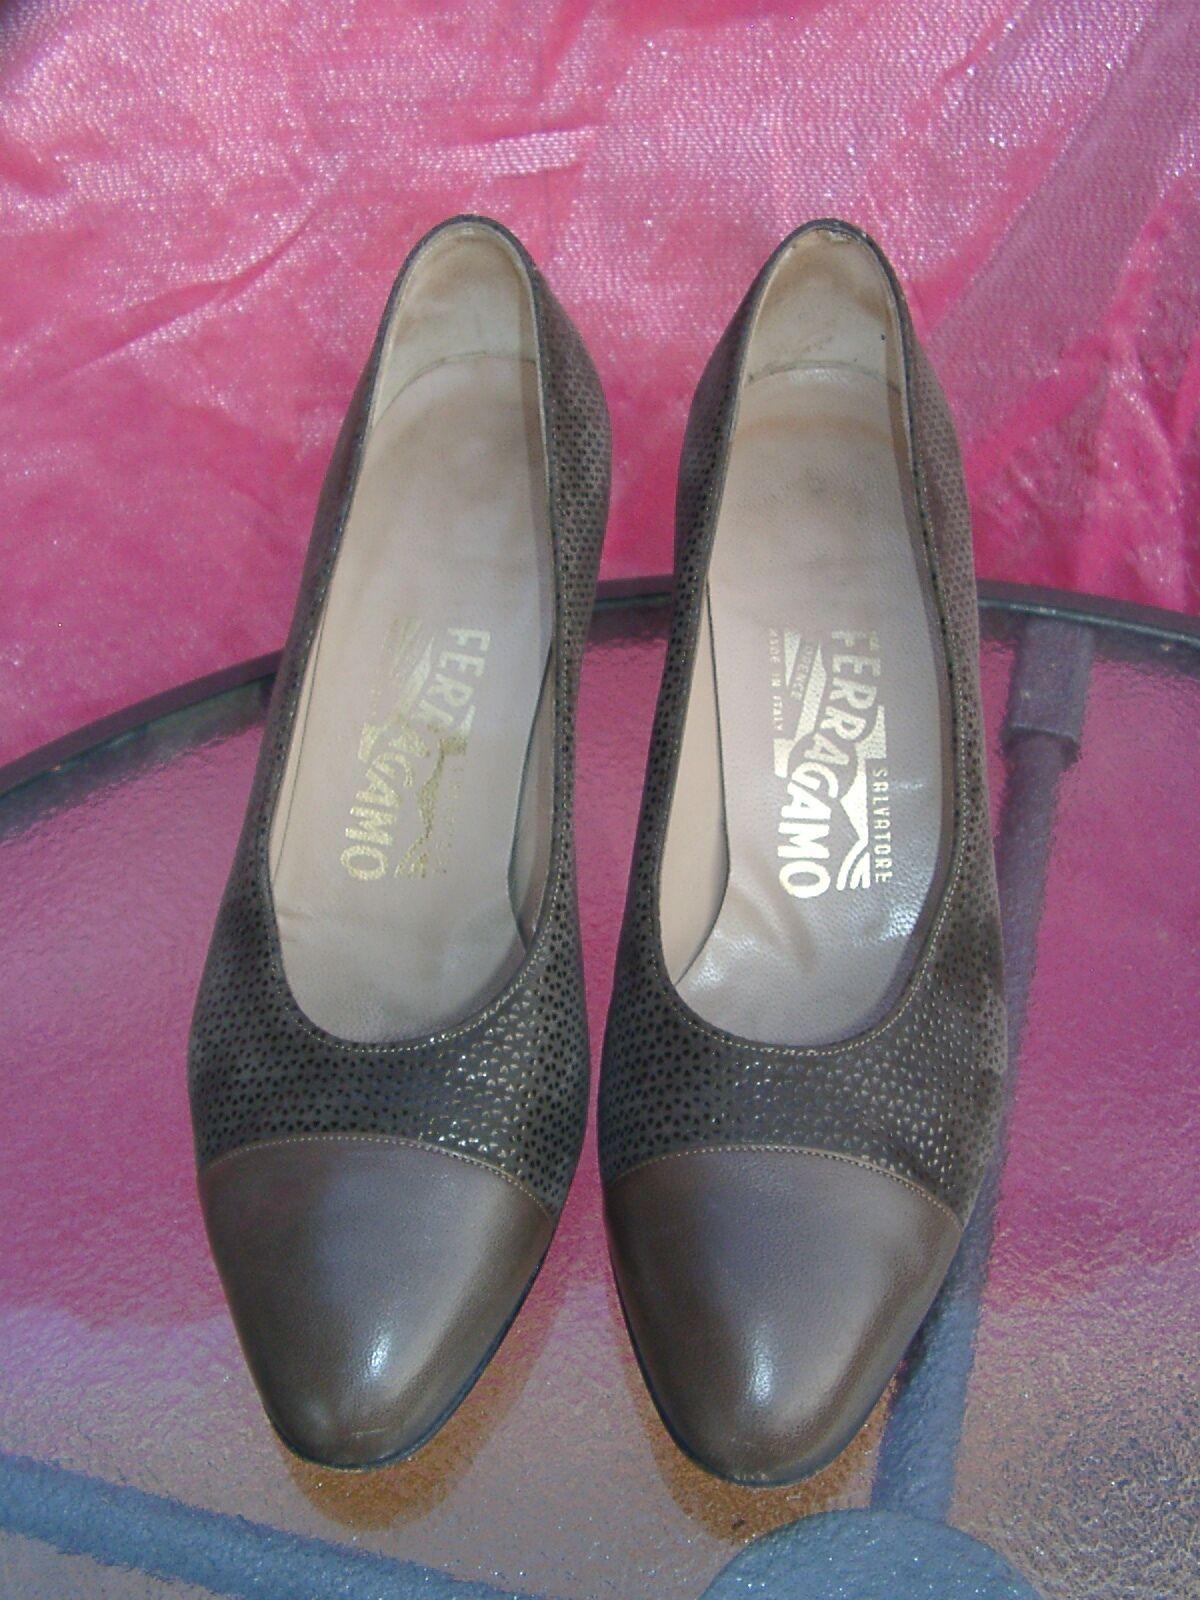 Salvatore FERRAGAMO 2.5  heels green suede brown leather toe cap pumps shoes